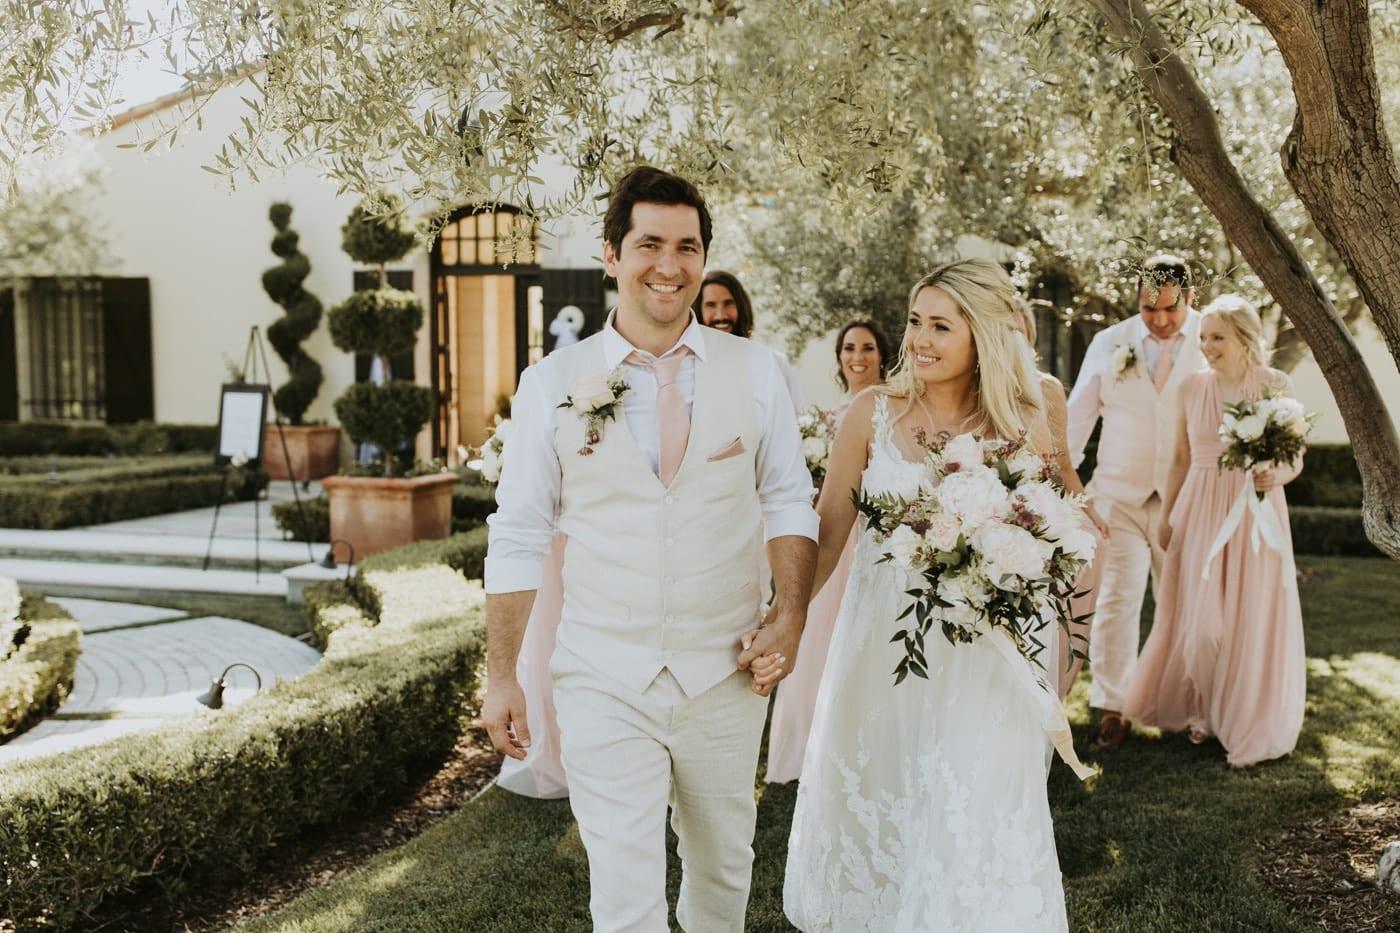 Real Weddings | Vinka Design | Real Brides Wearing Vinka Gowns | Camille and Aaron walking through beautiful groundsa